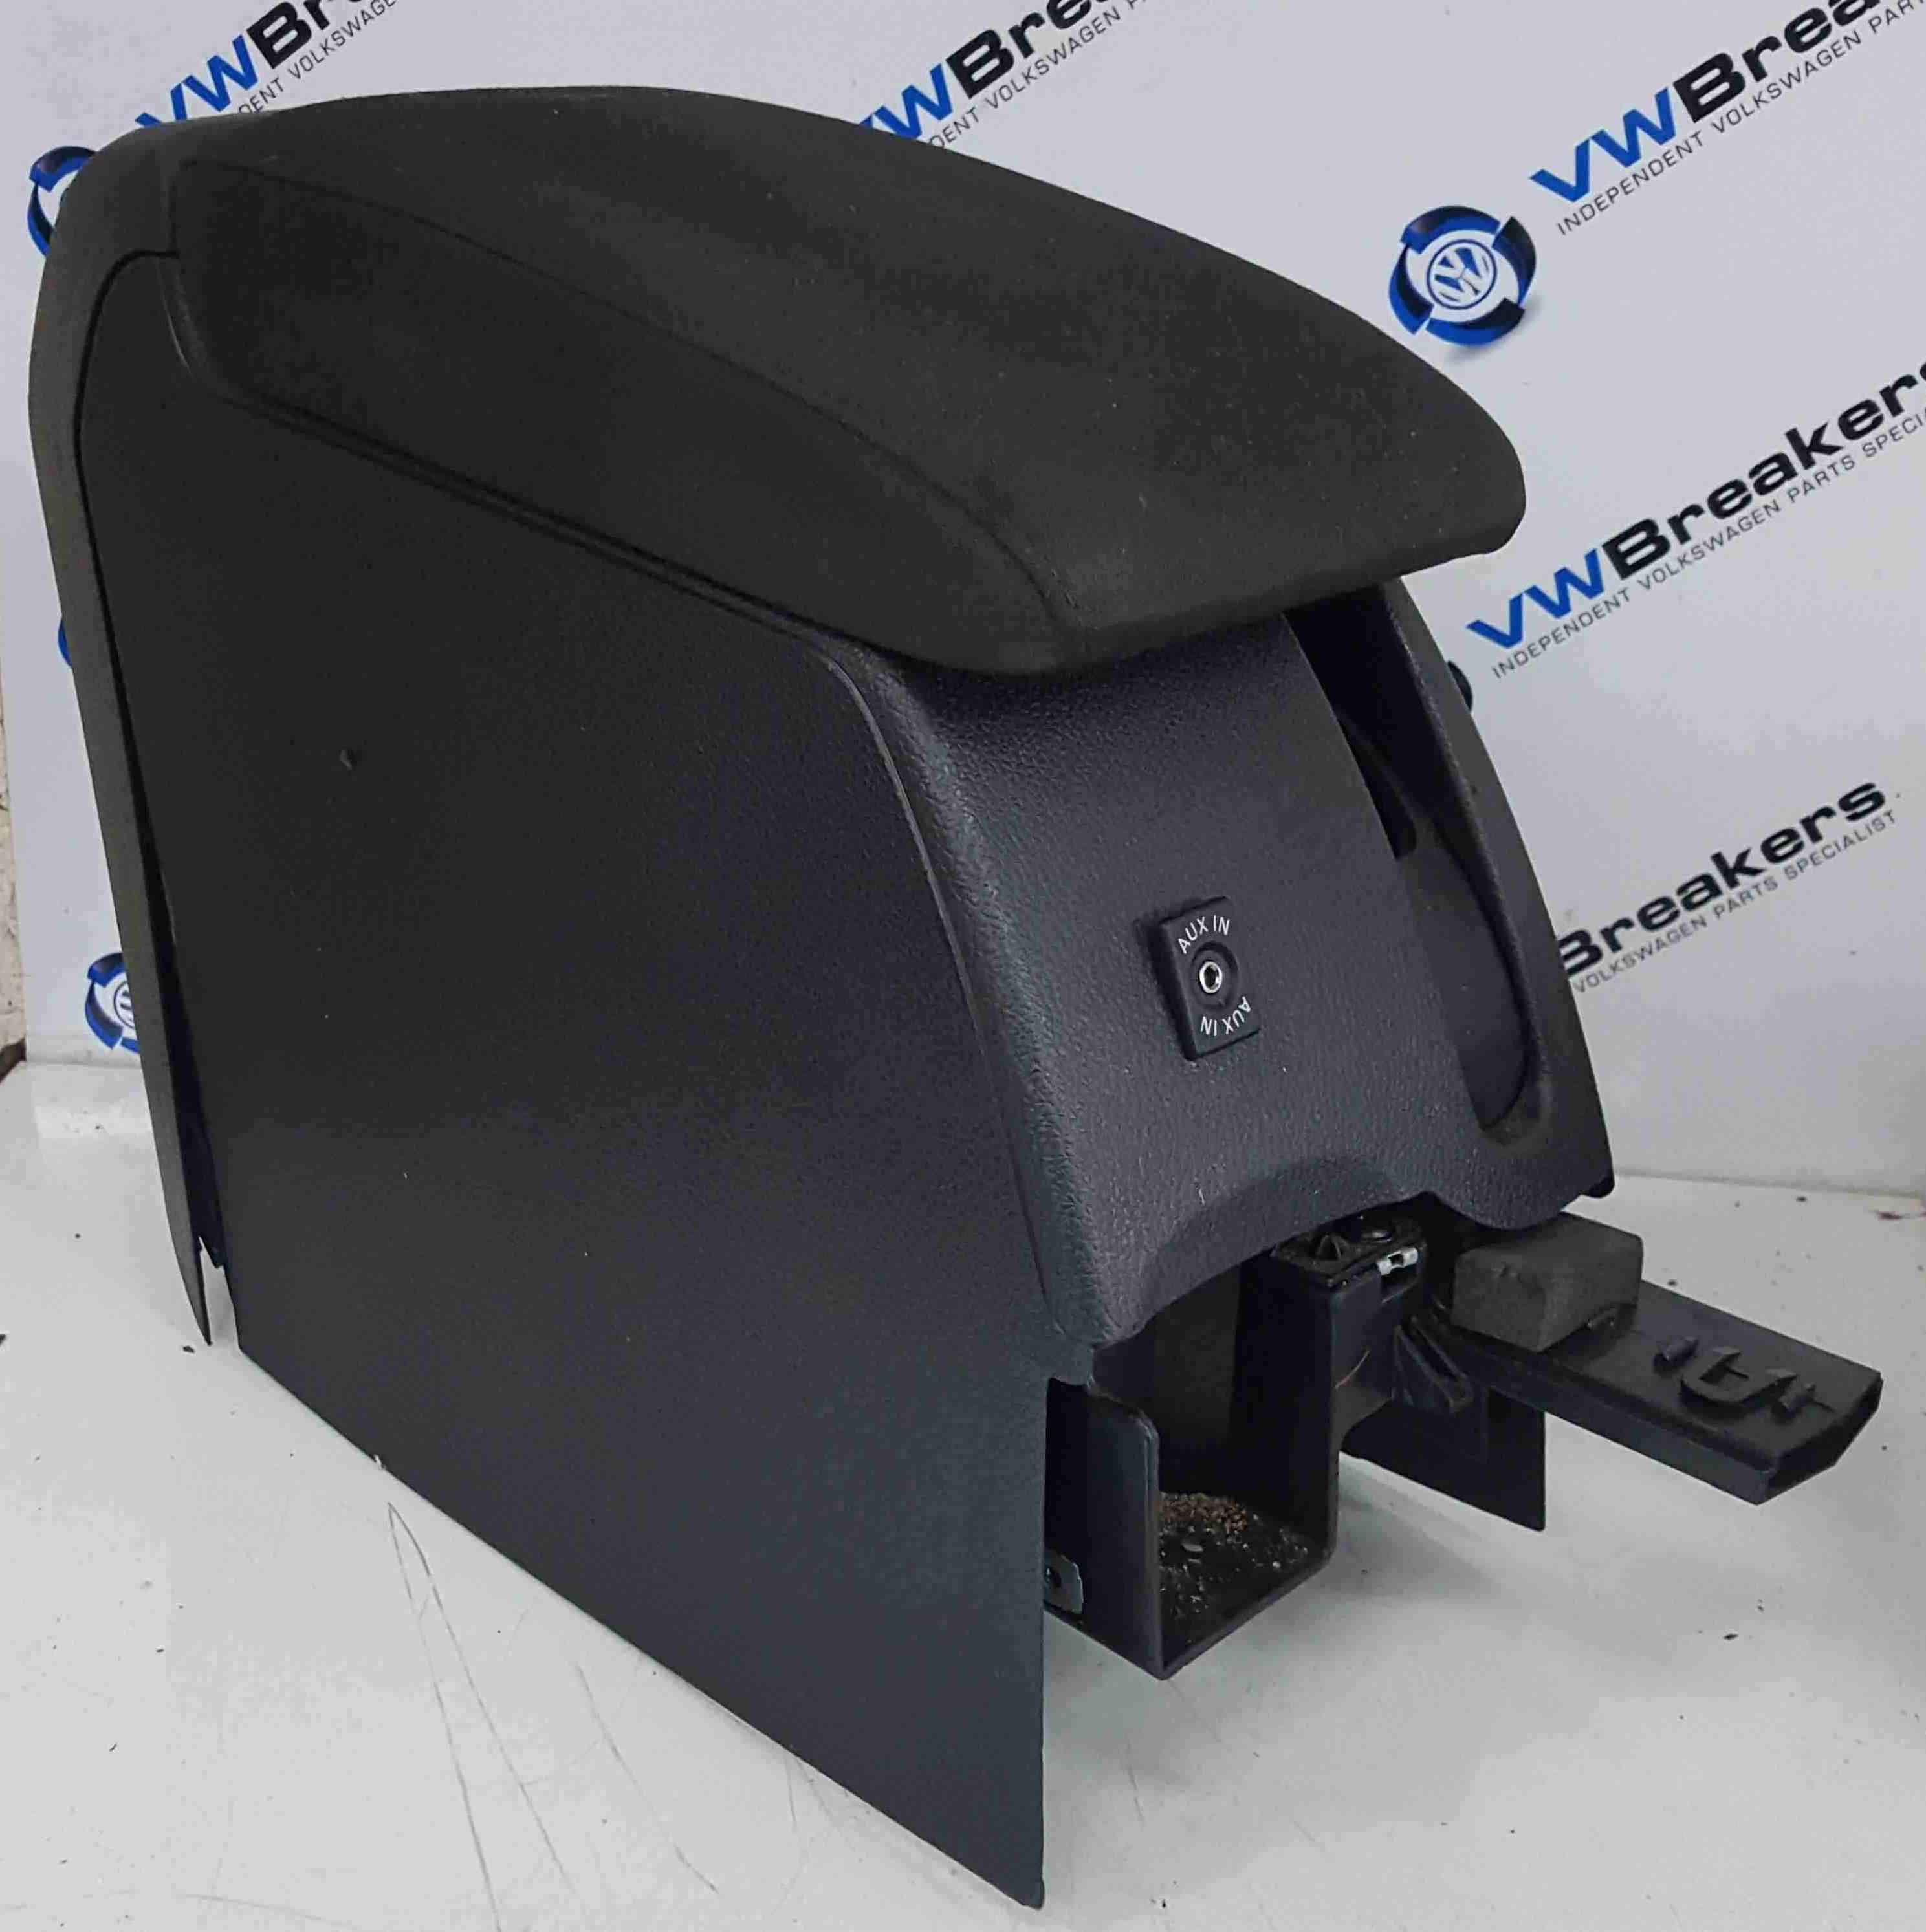 Volkswagen Scirocco 2008-2014 Centre Arm Rest Console Armrest